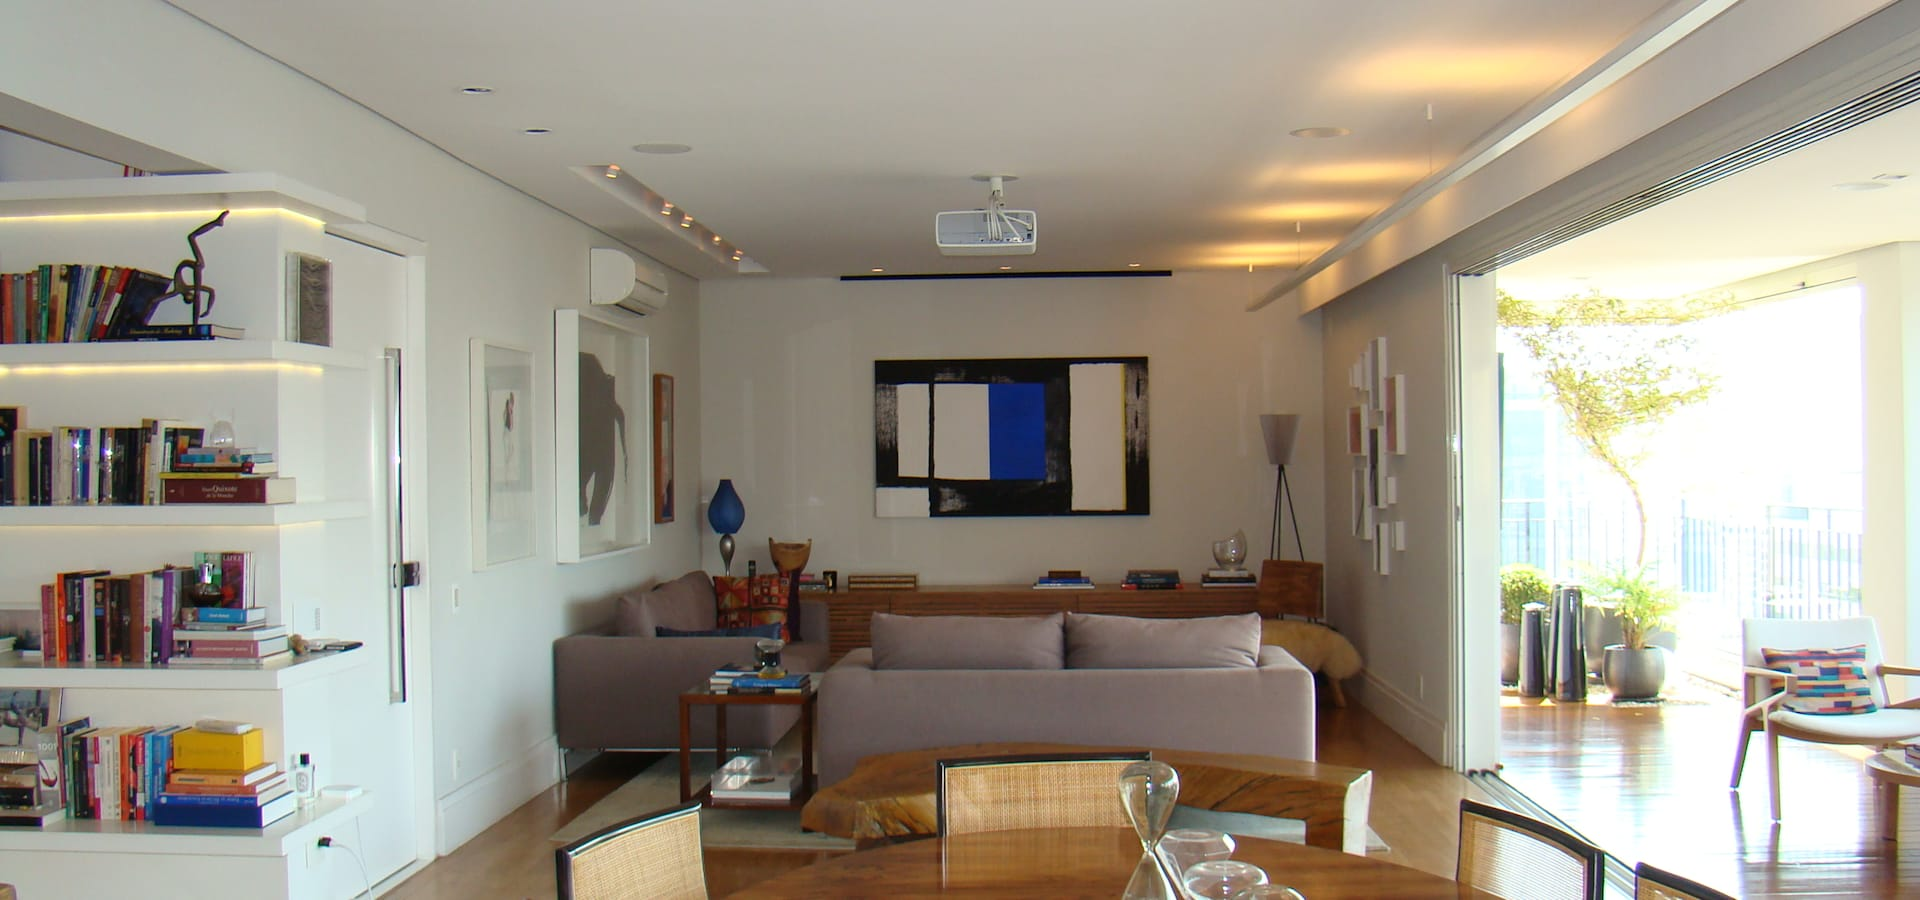 Luli Hamburger Arquitetura